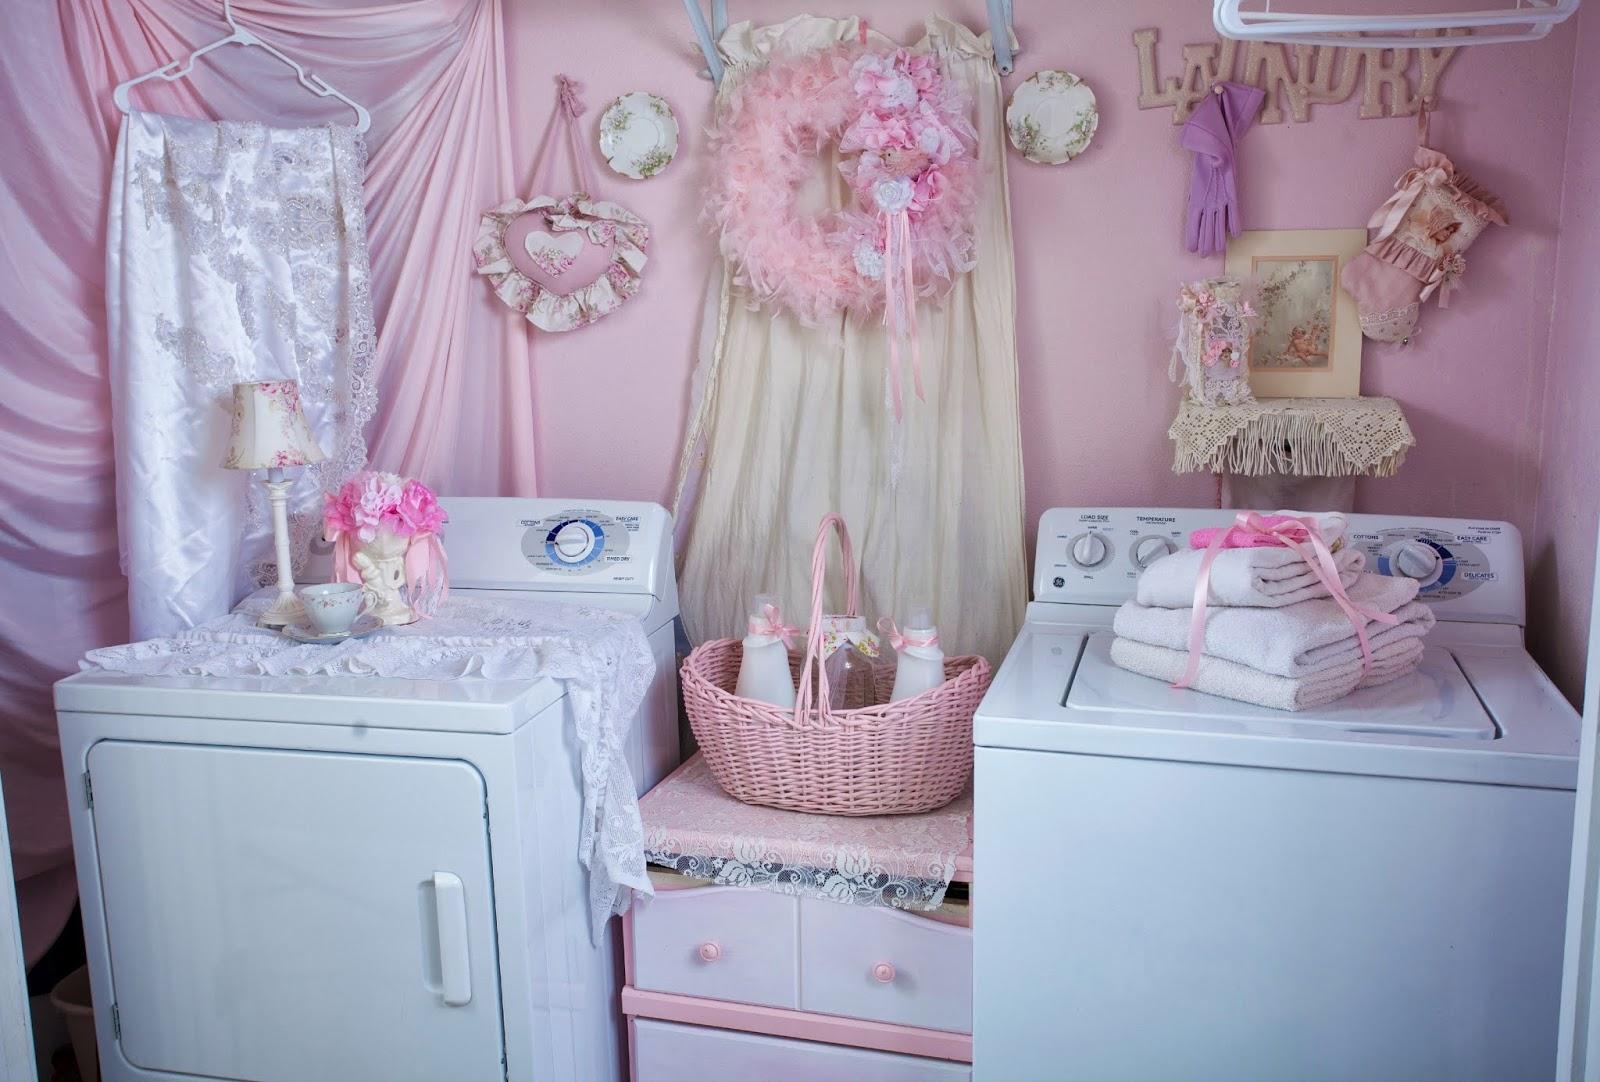 Romantic shabby chic home romantic shabby chic blog - Shabby Chic Pink Laundry Room